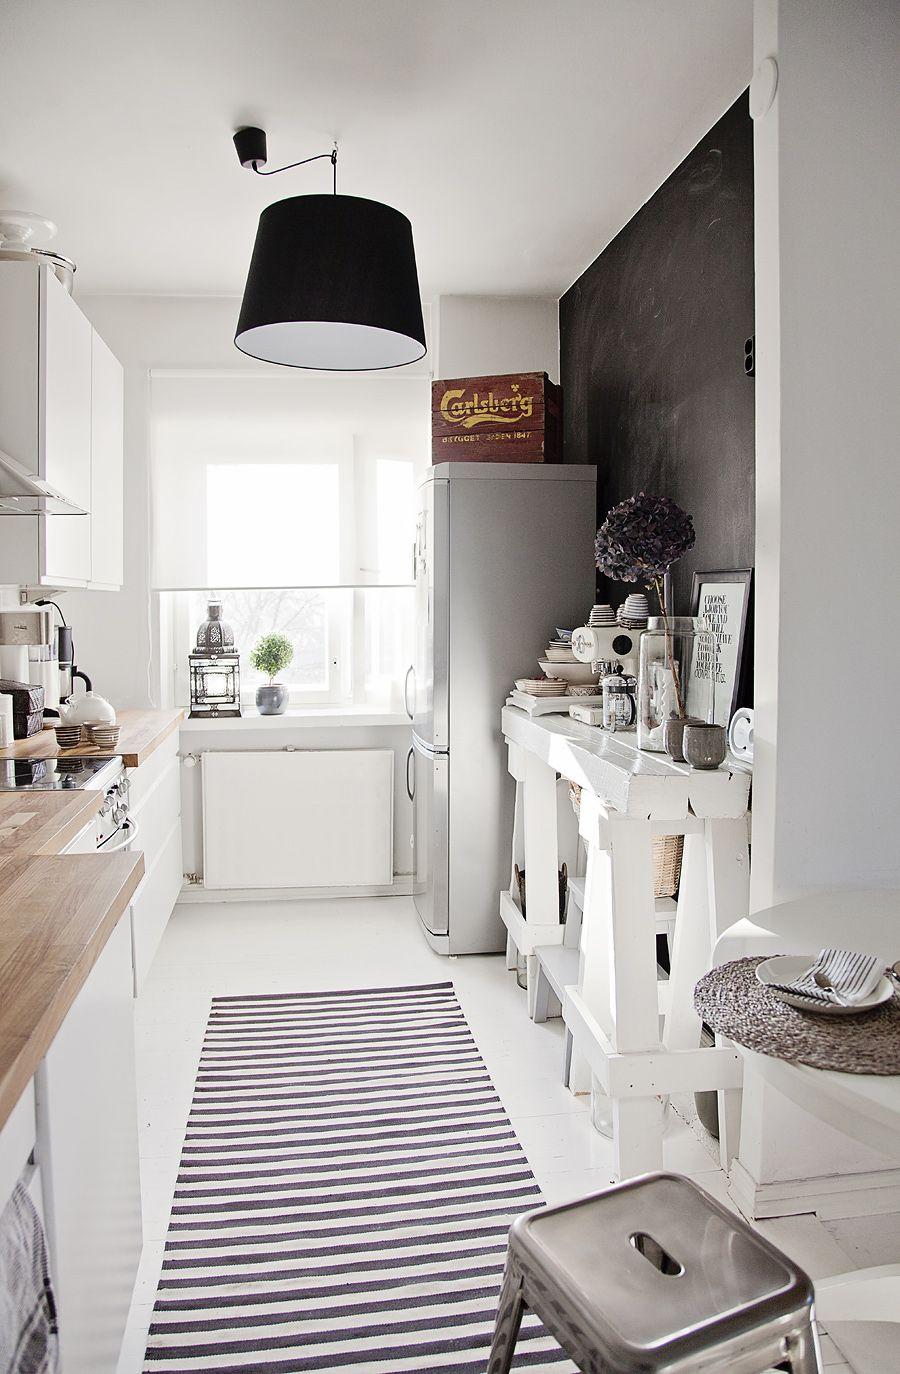 styling - interieur - exterieur - wonen - decoratie - aankleding ...